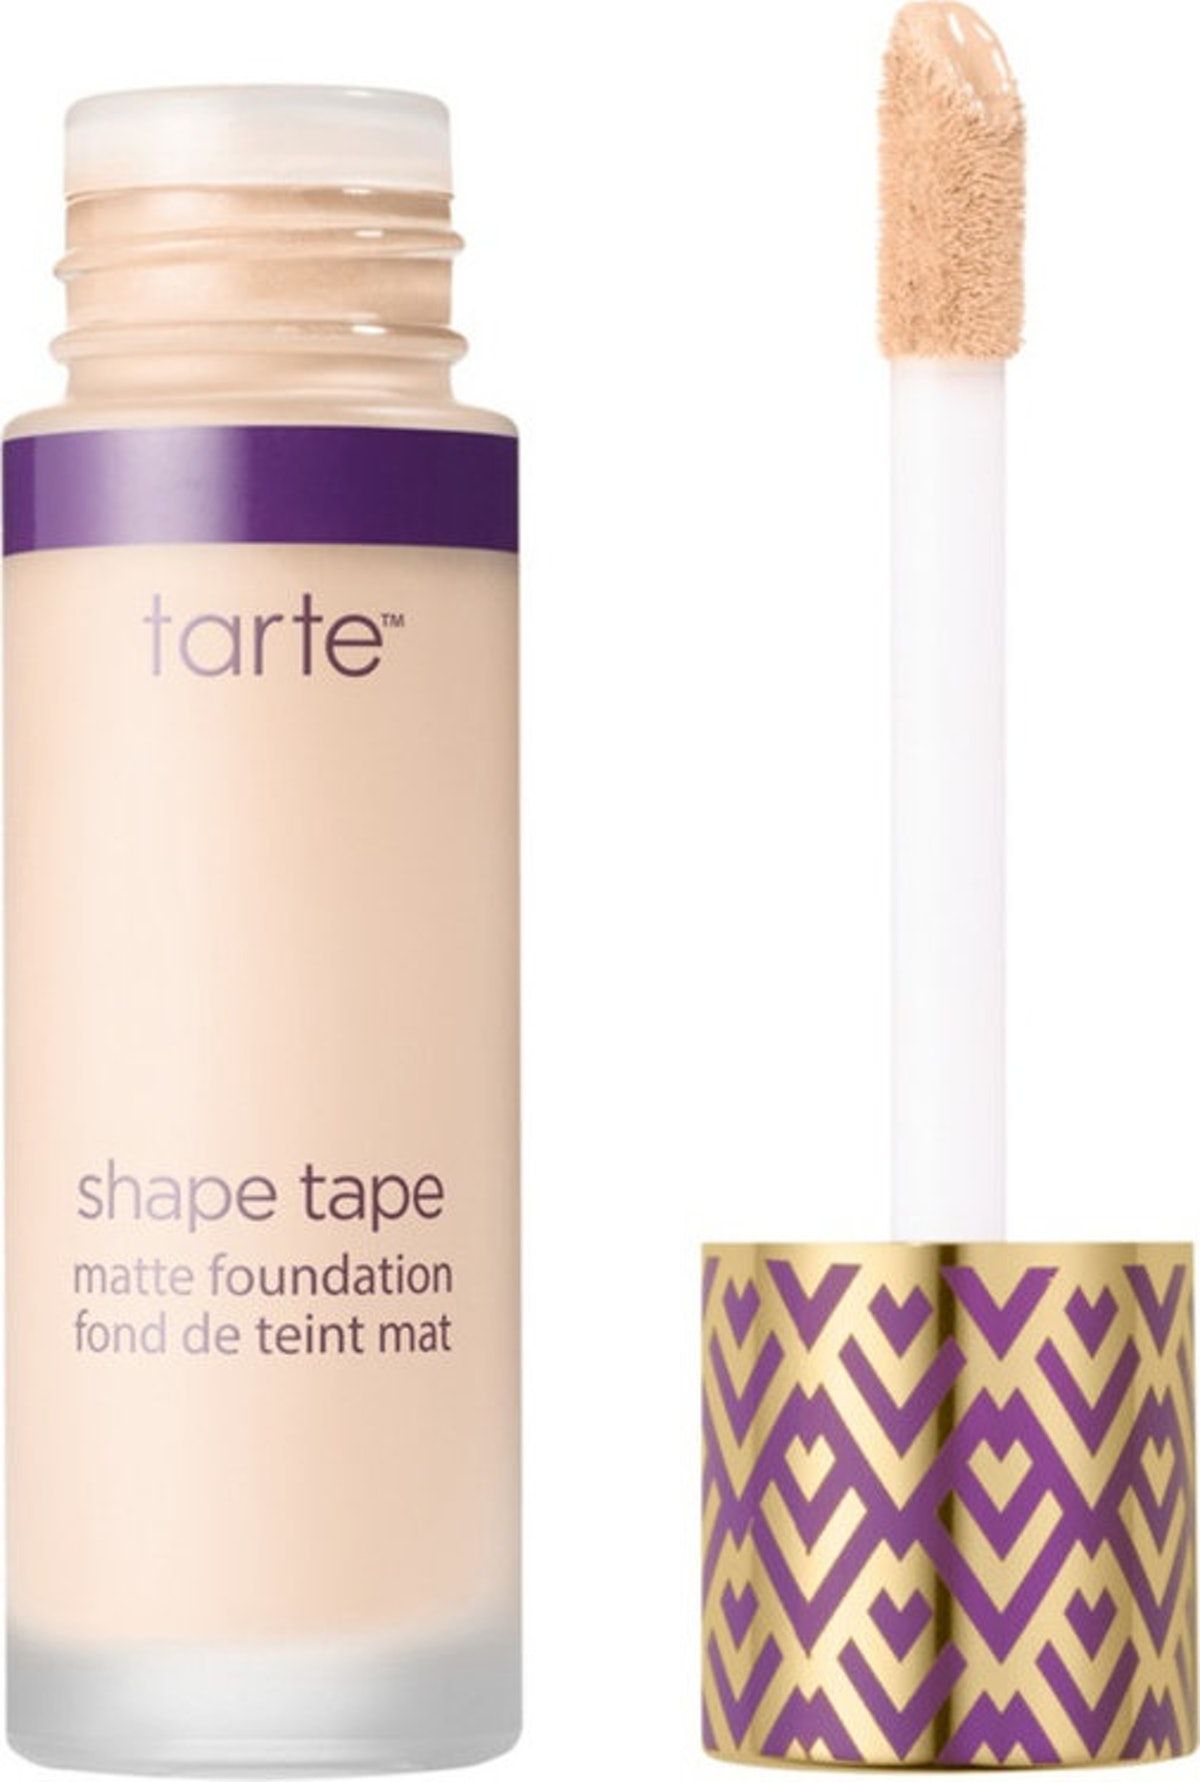 Shape Tape Matte Foundation